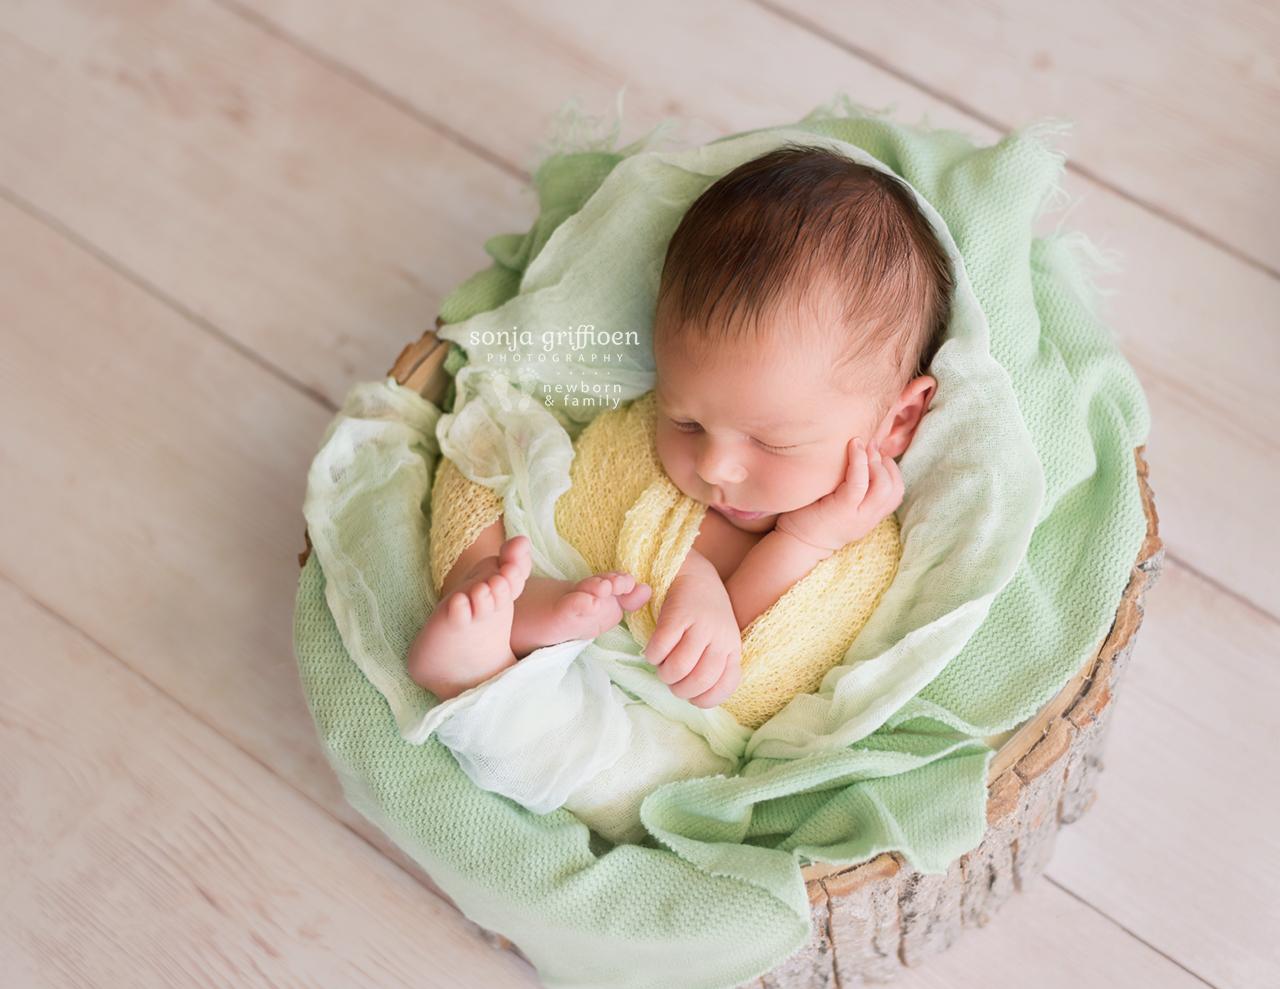 Marko-Newborn-Brisbane-Newborn-Photographer-Sonja-Griffioen-21.jpg